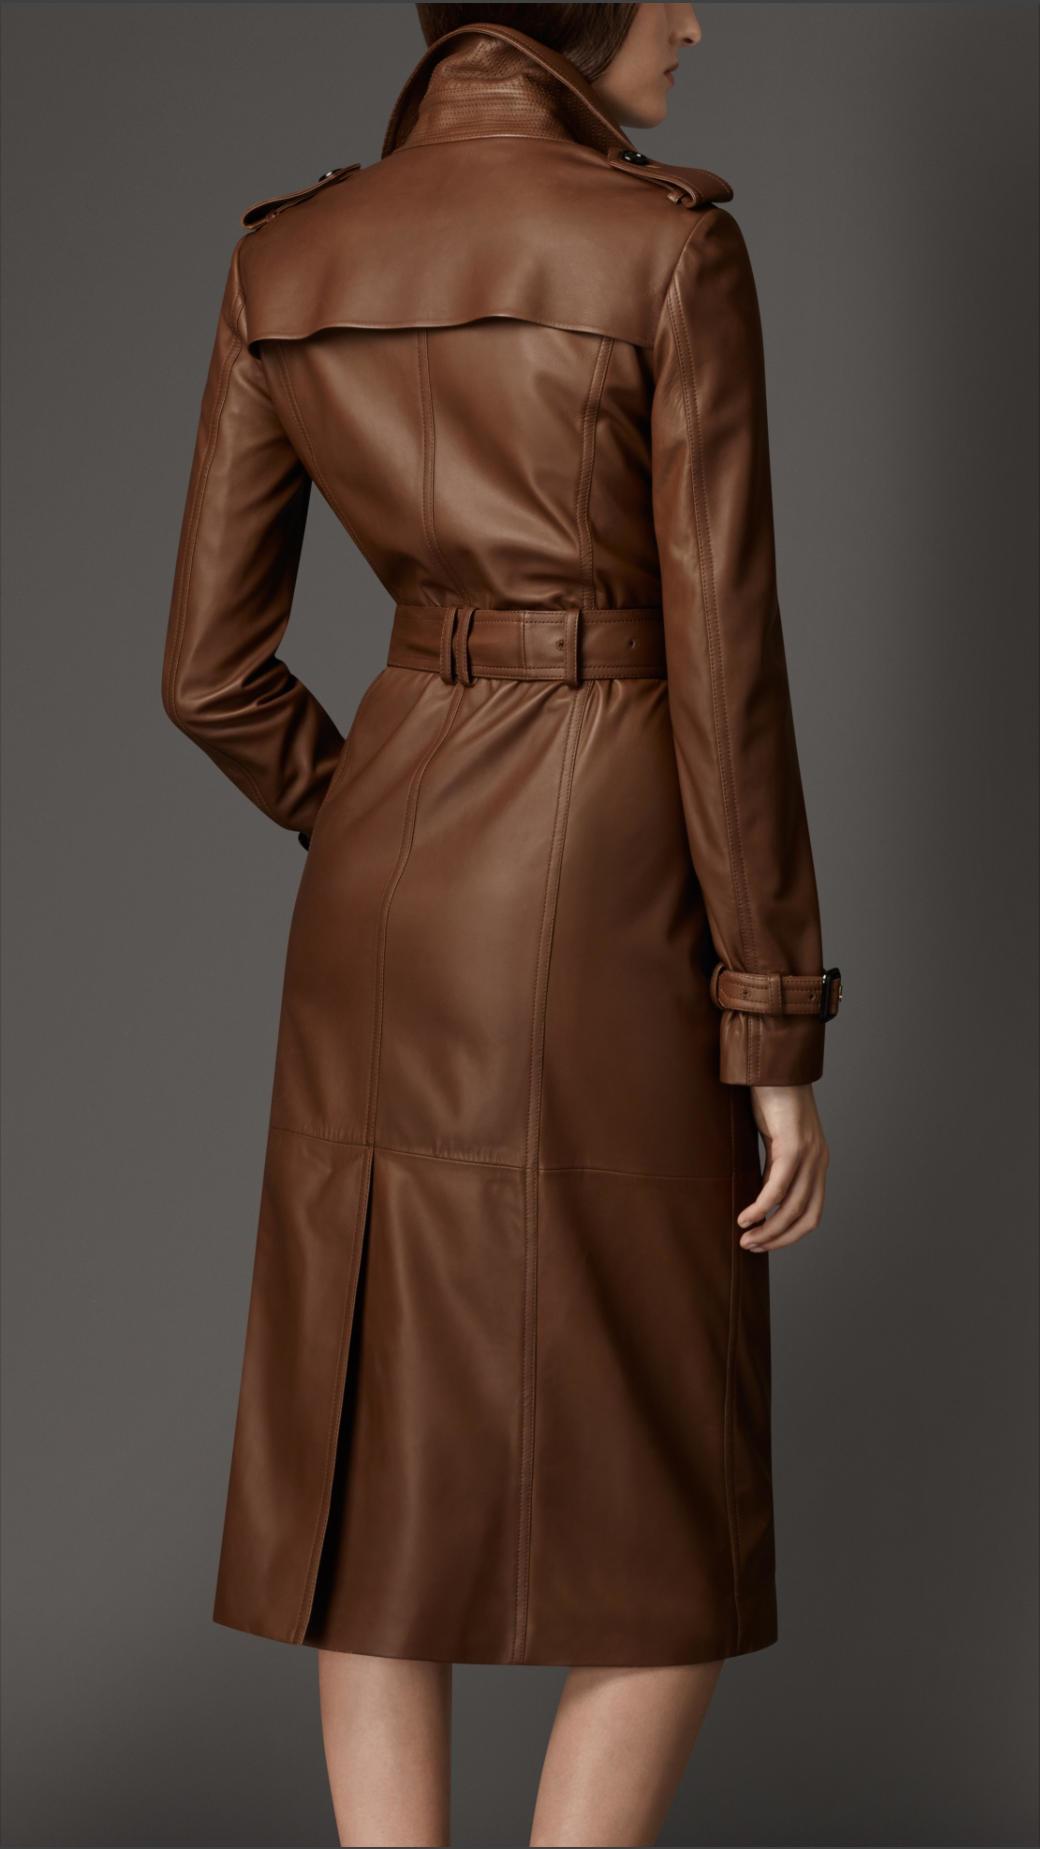 Brown Leather Trench Coat Womens Xm03 Advancedmassagebysara